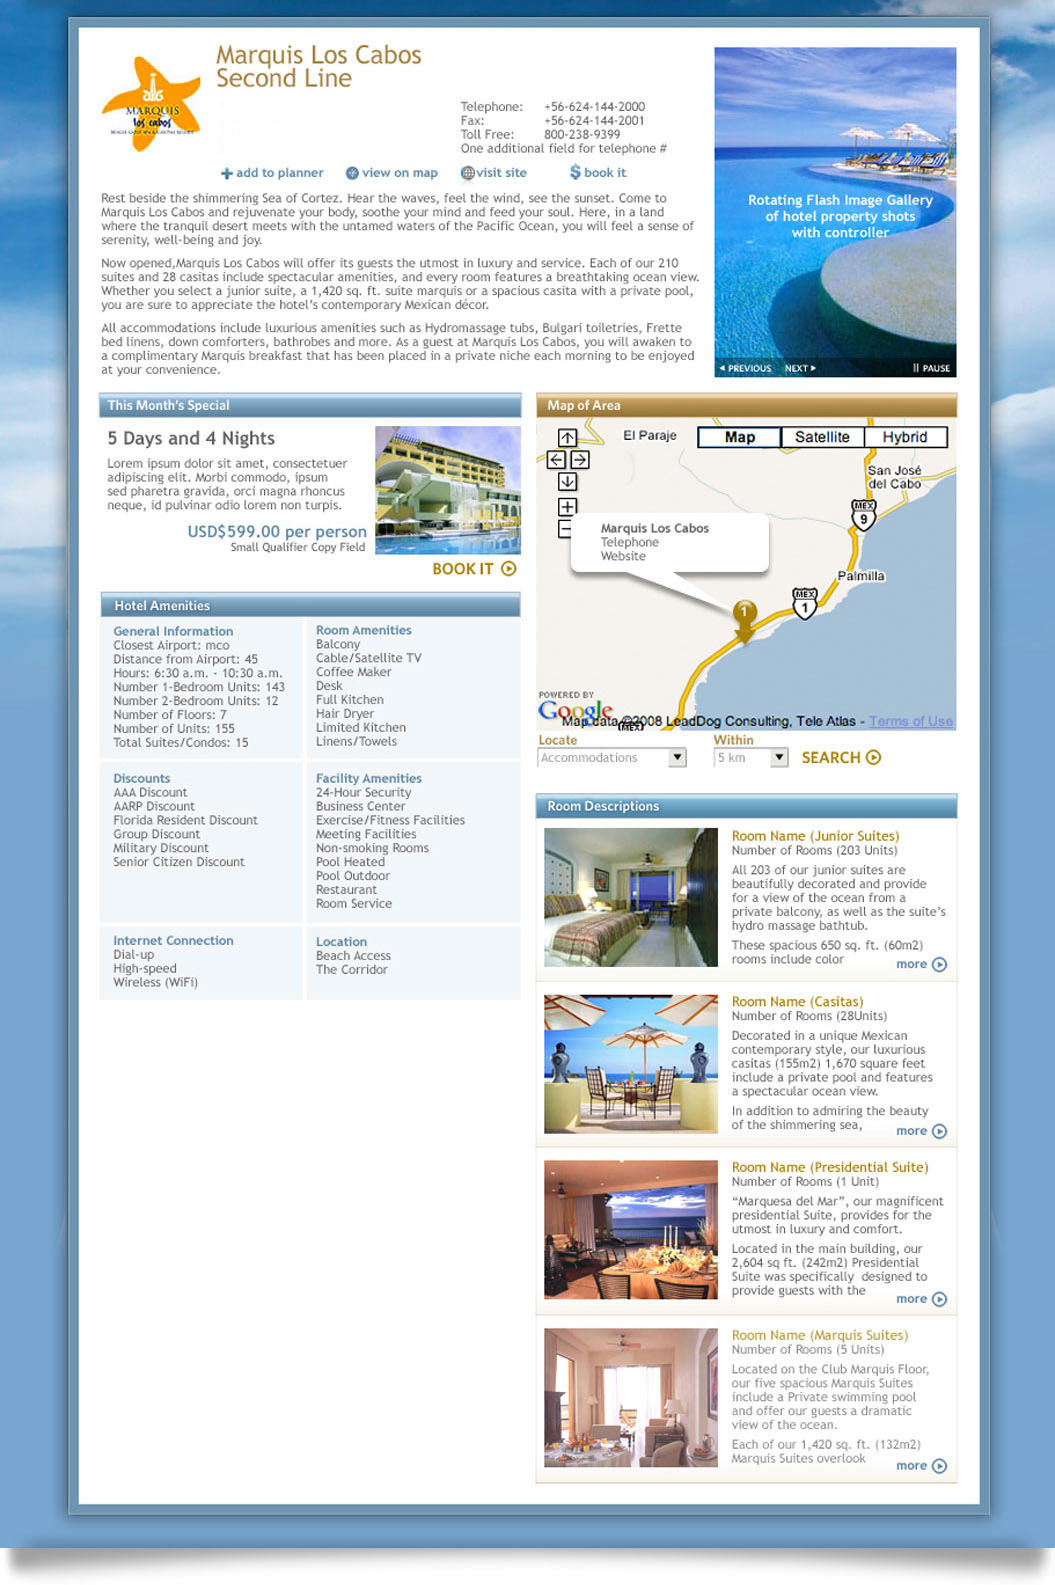 Los Cabos online hotel detail